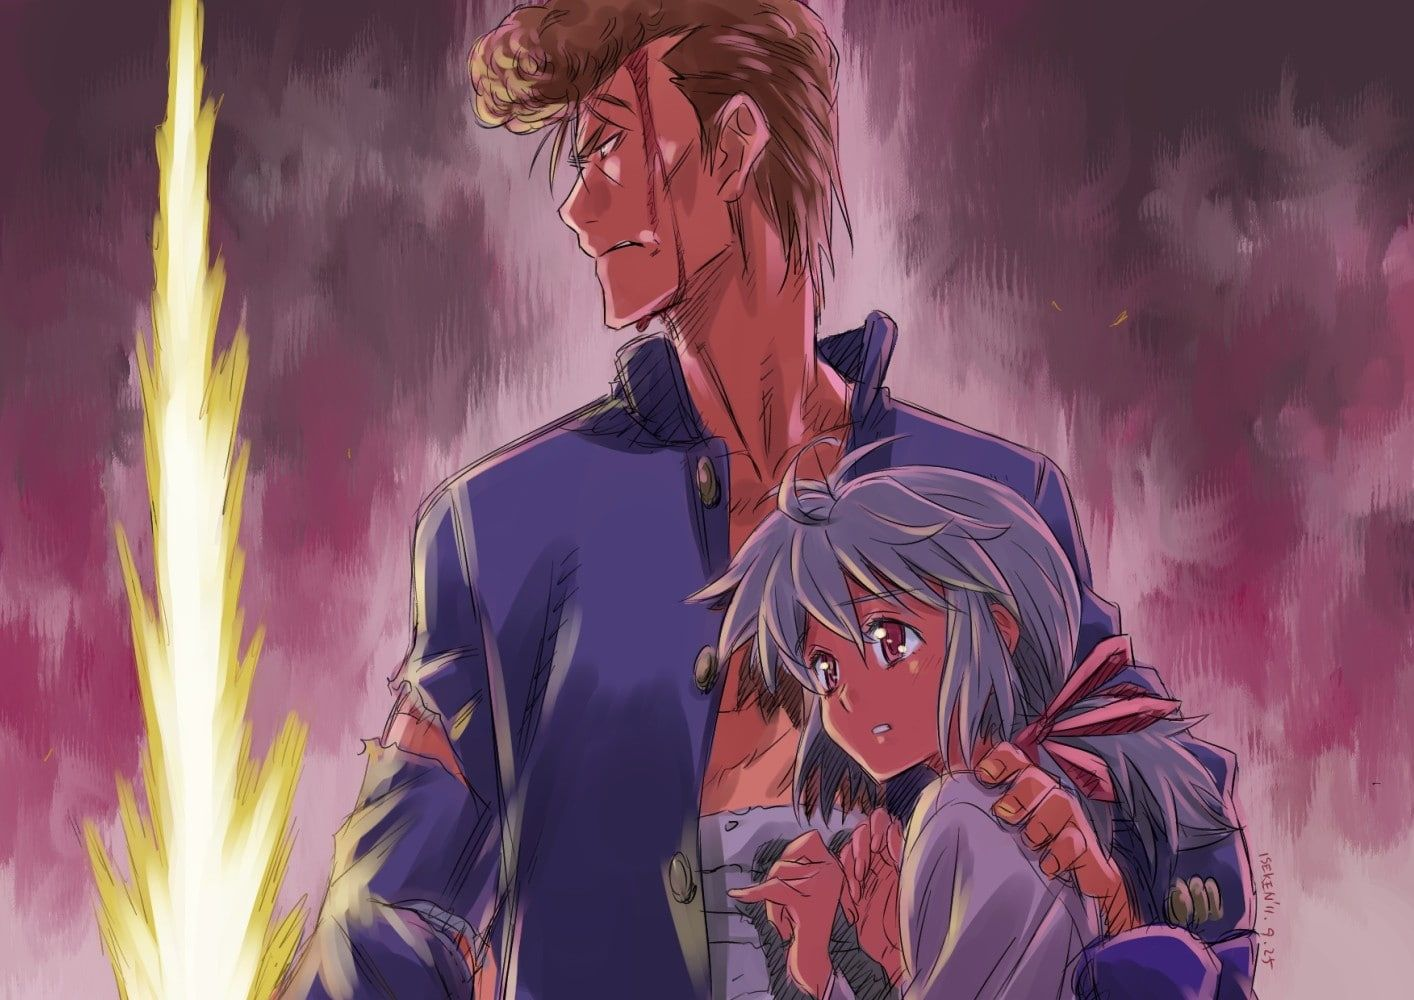 Anime Yu Yu Hakusho 720p Wallpaper Hdwallpaper Desktop Anime